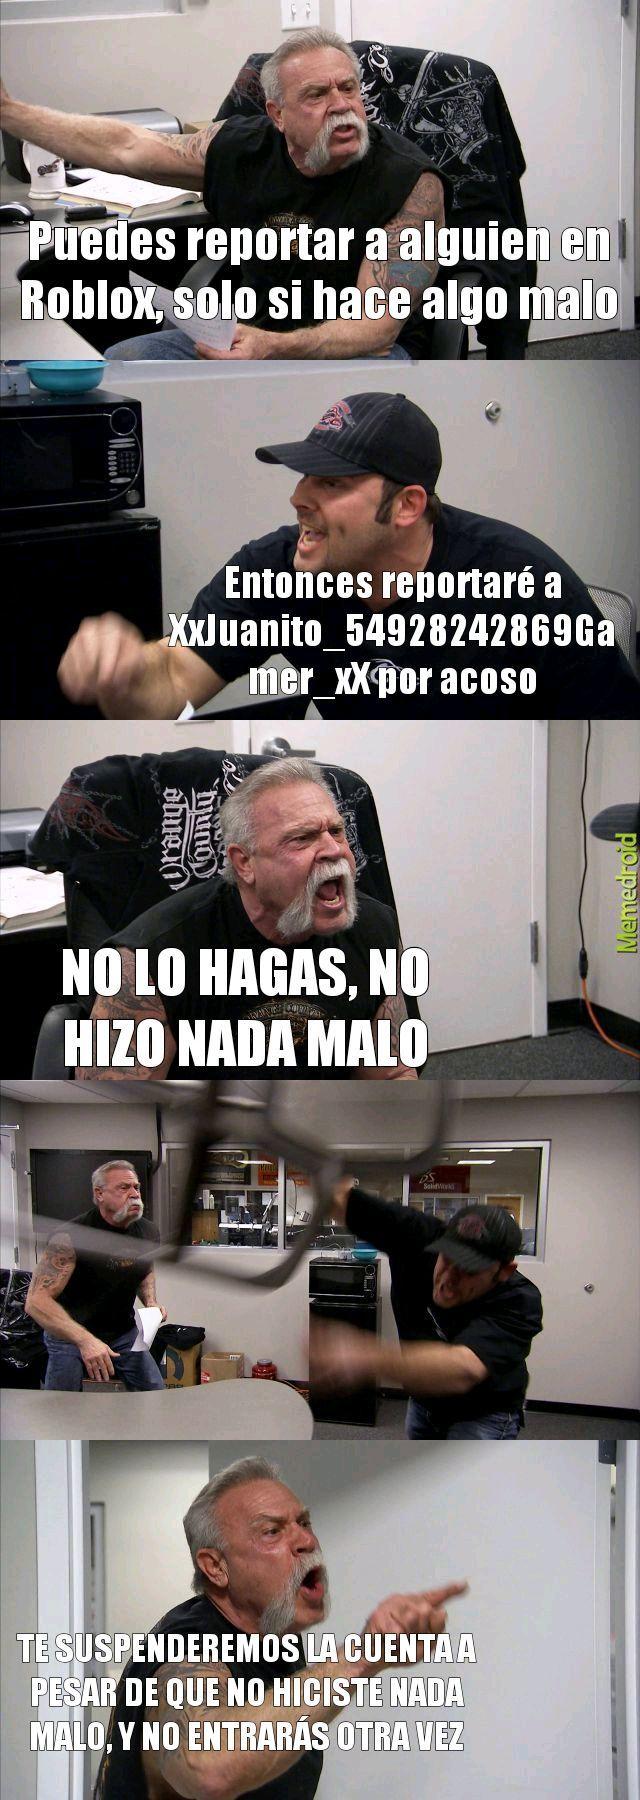 Momento Jailbreak (Segundo Momo) - meme